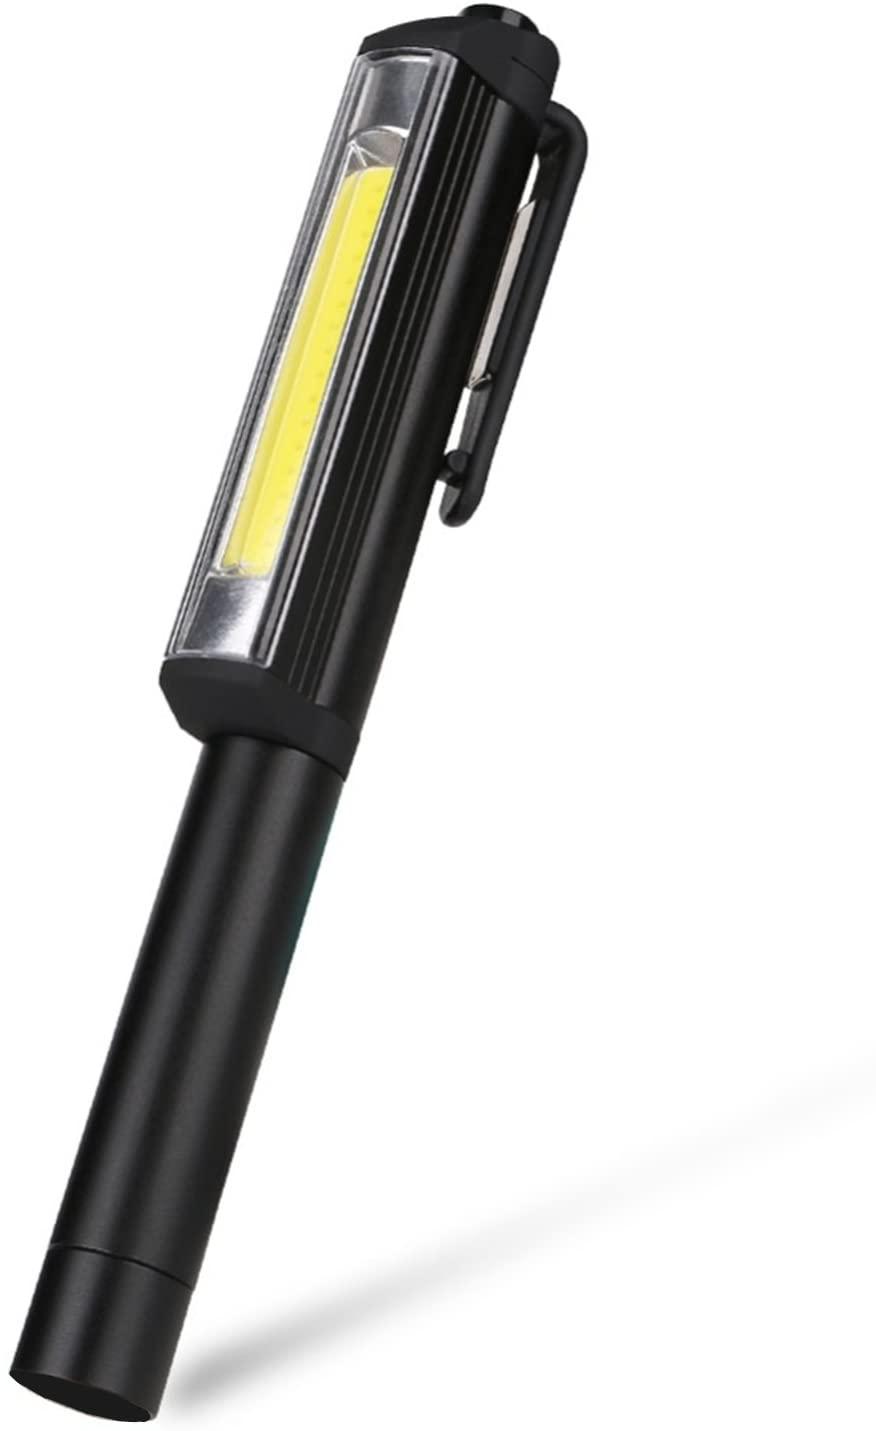 TAIYIdz Ultra Bright COB 220 Lumen LED Pocket Pen Work Light with Rotating Magnetic Clip. Camping, Househeld, Workshop, Automobile(BLACK)